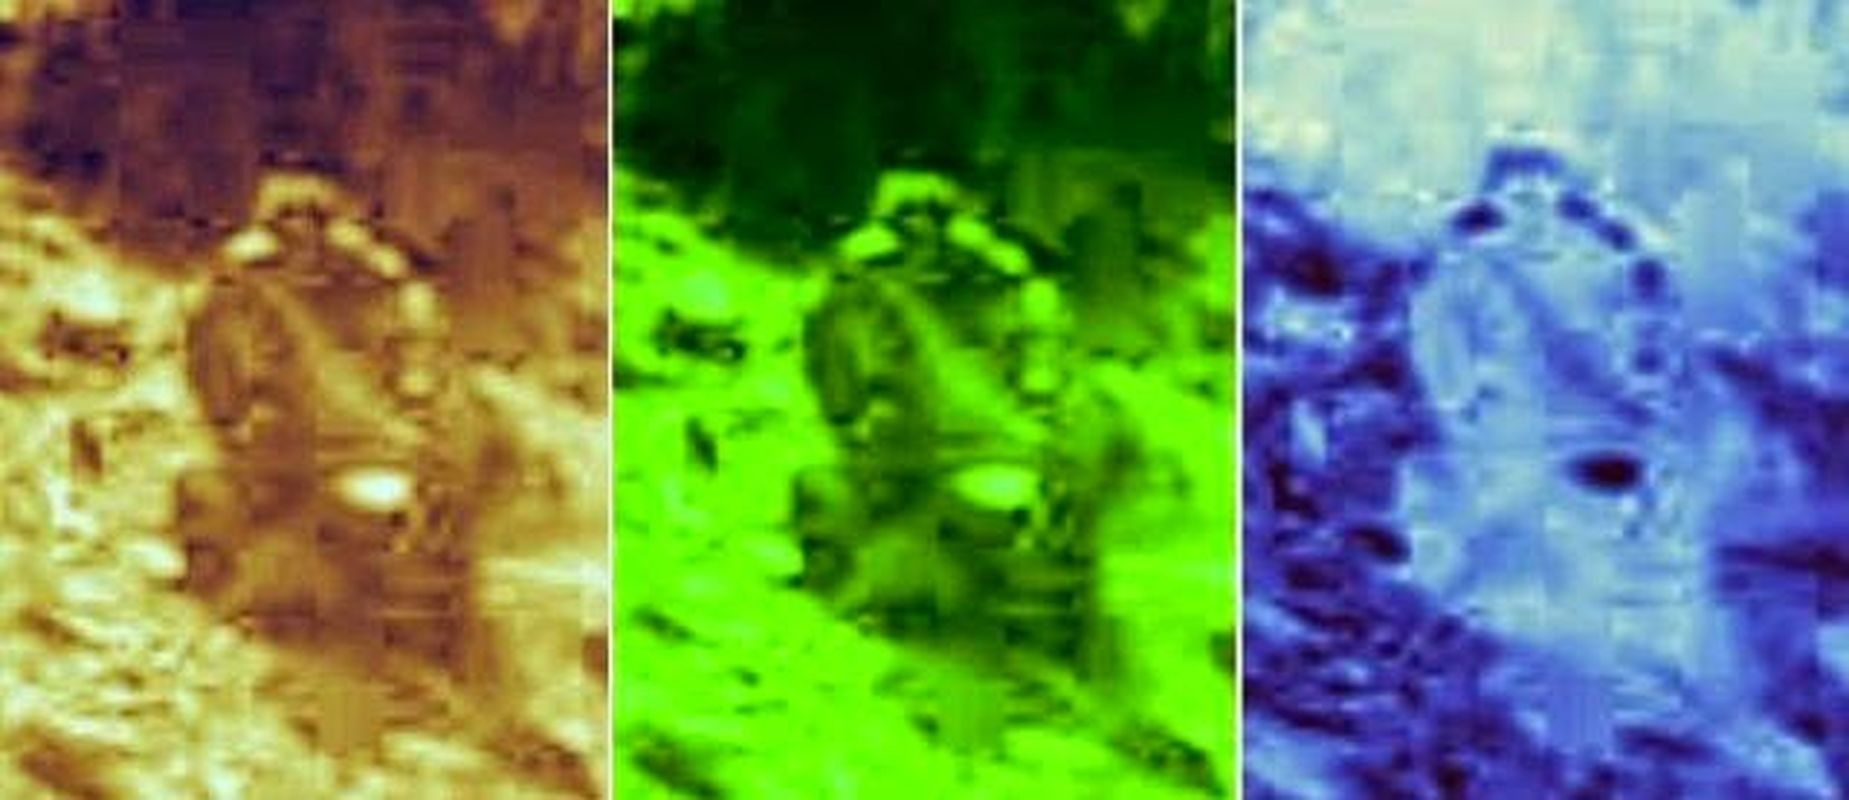 ¿Figura humanoide en un vehículo captada en Marte?